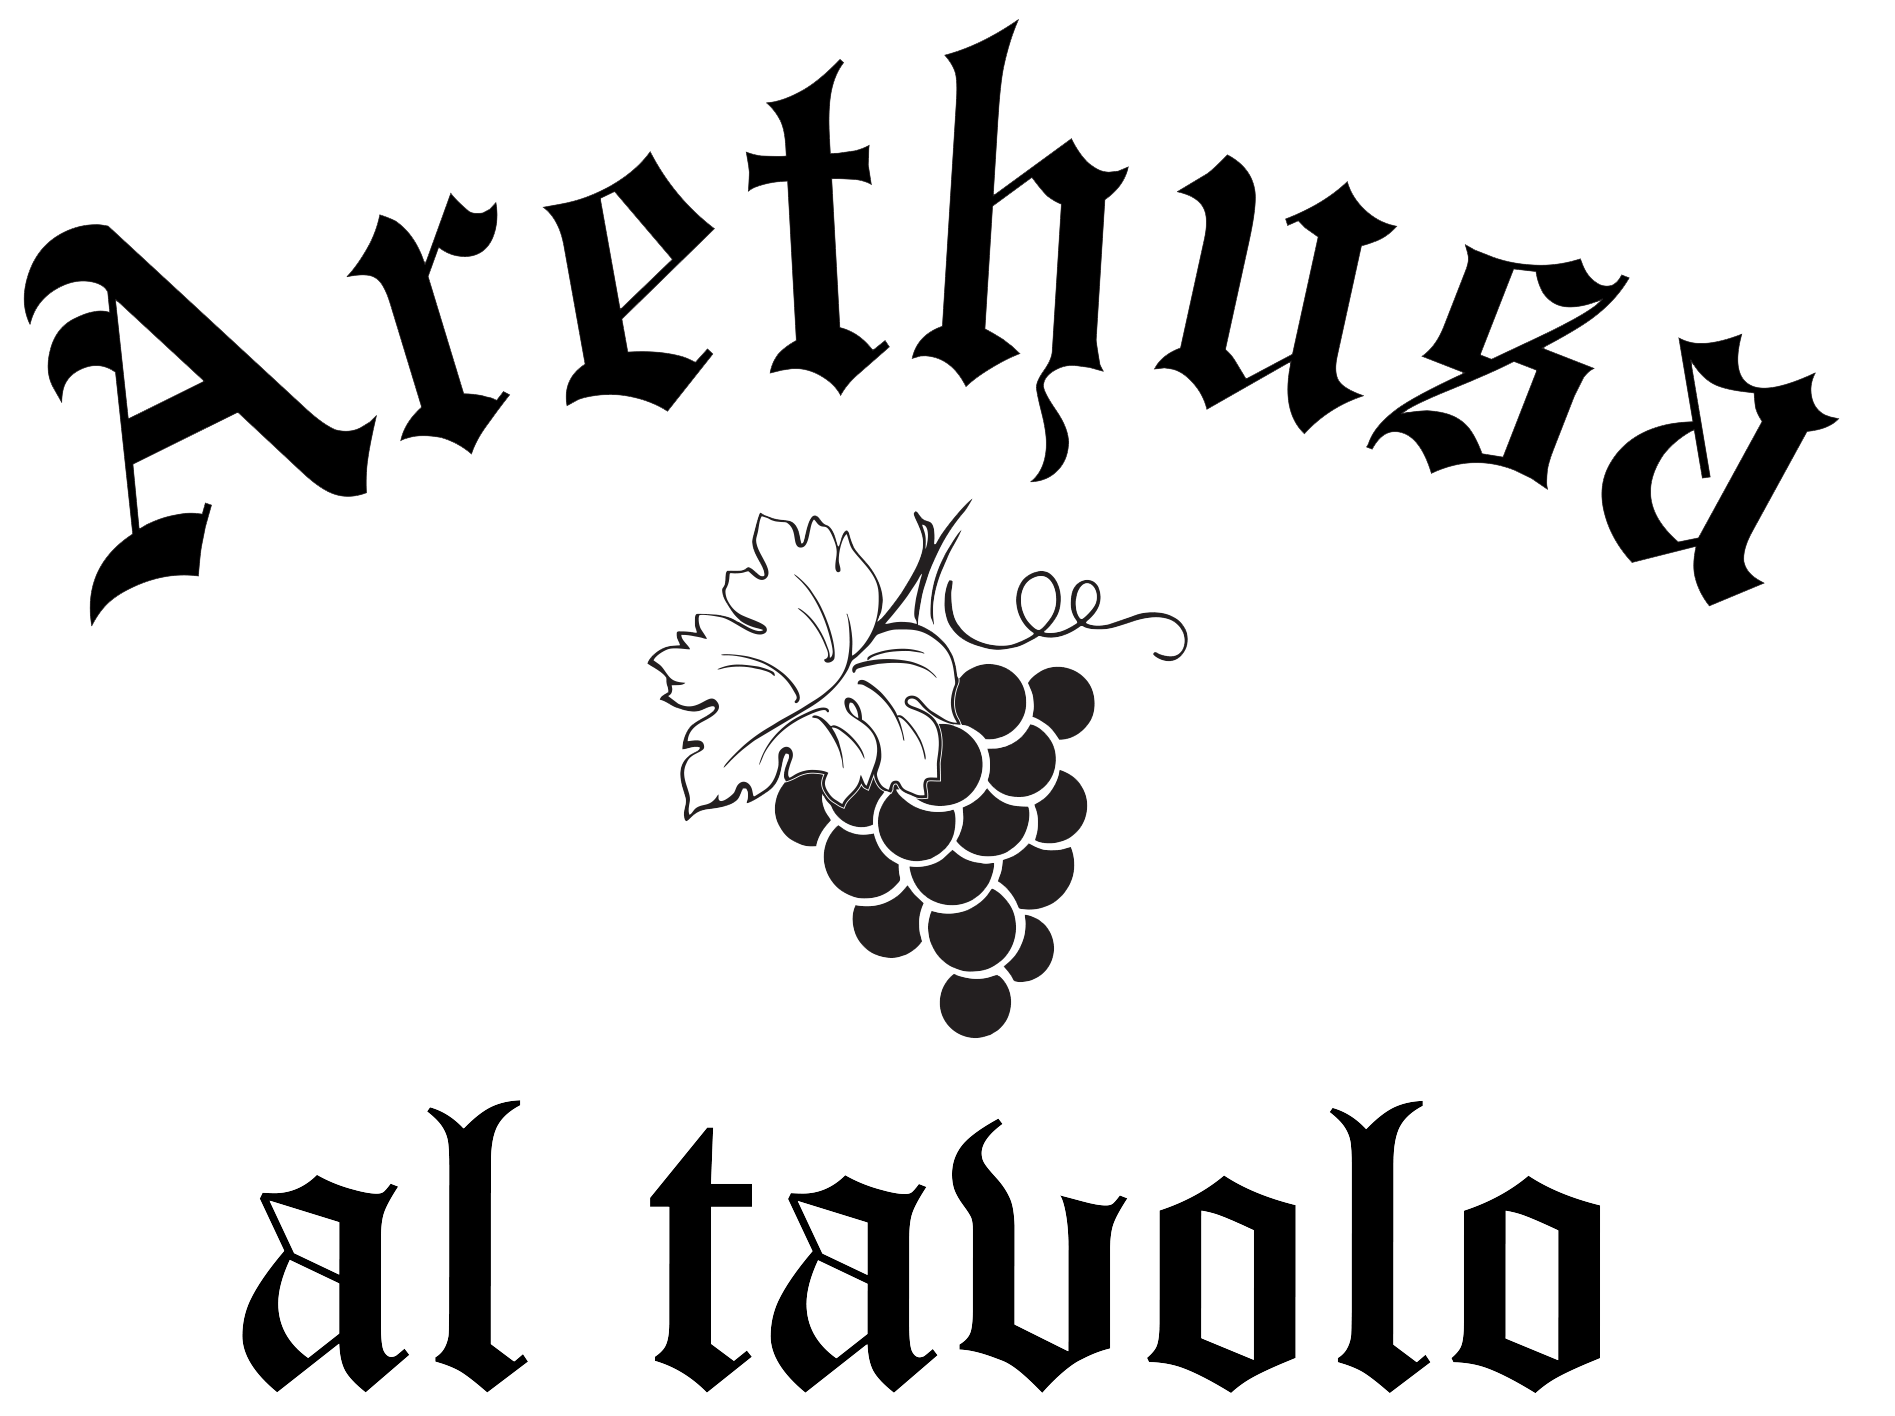 Arethusa al tavolo logo